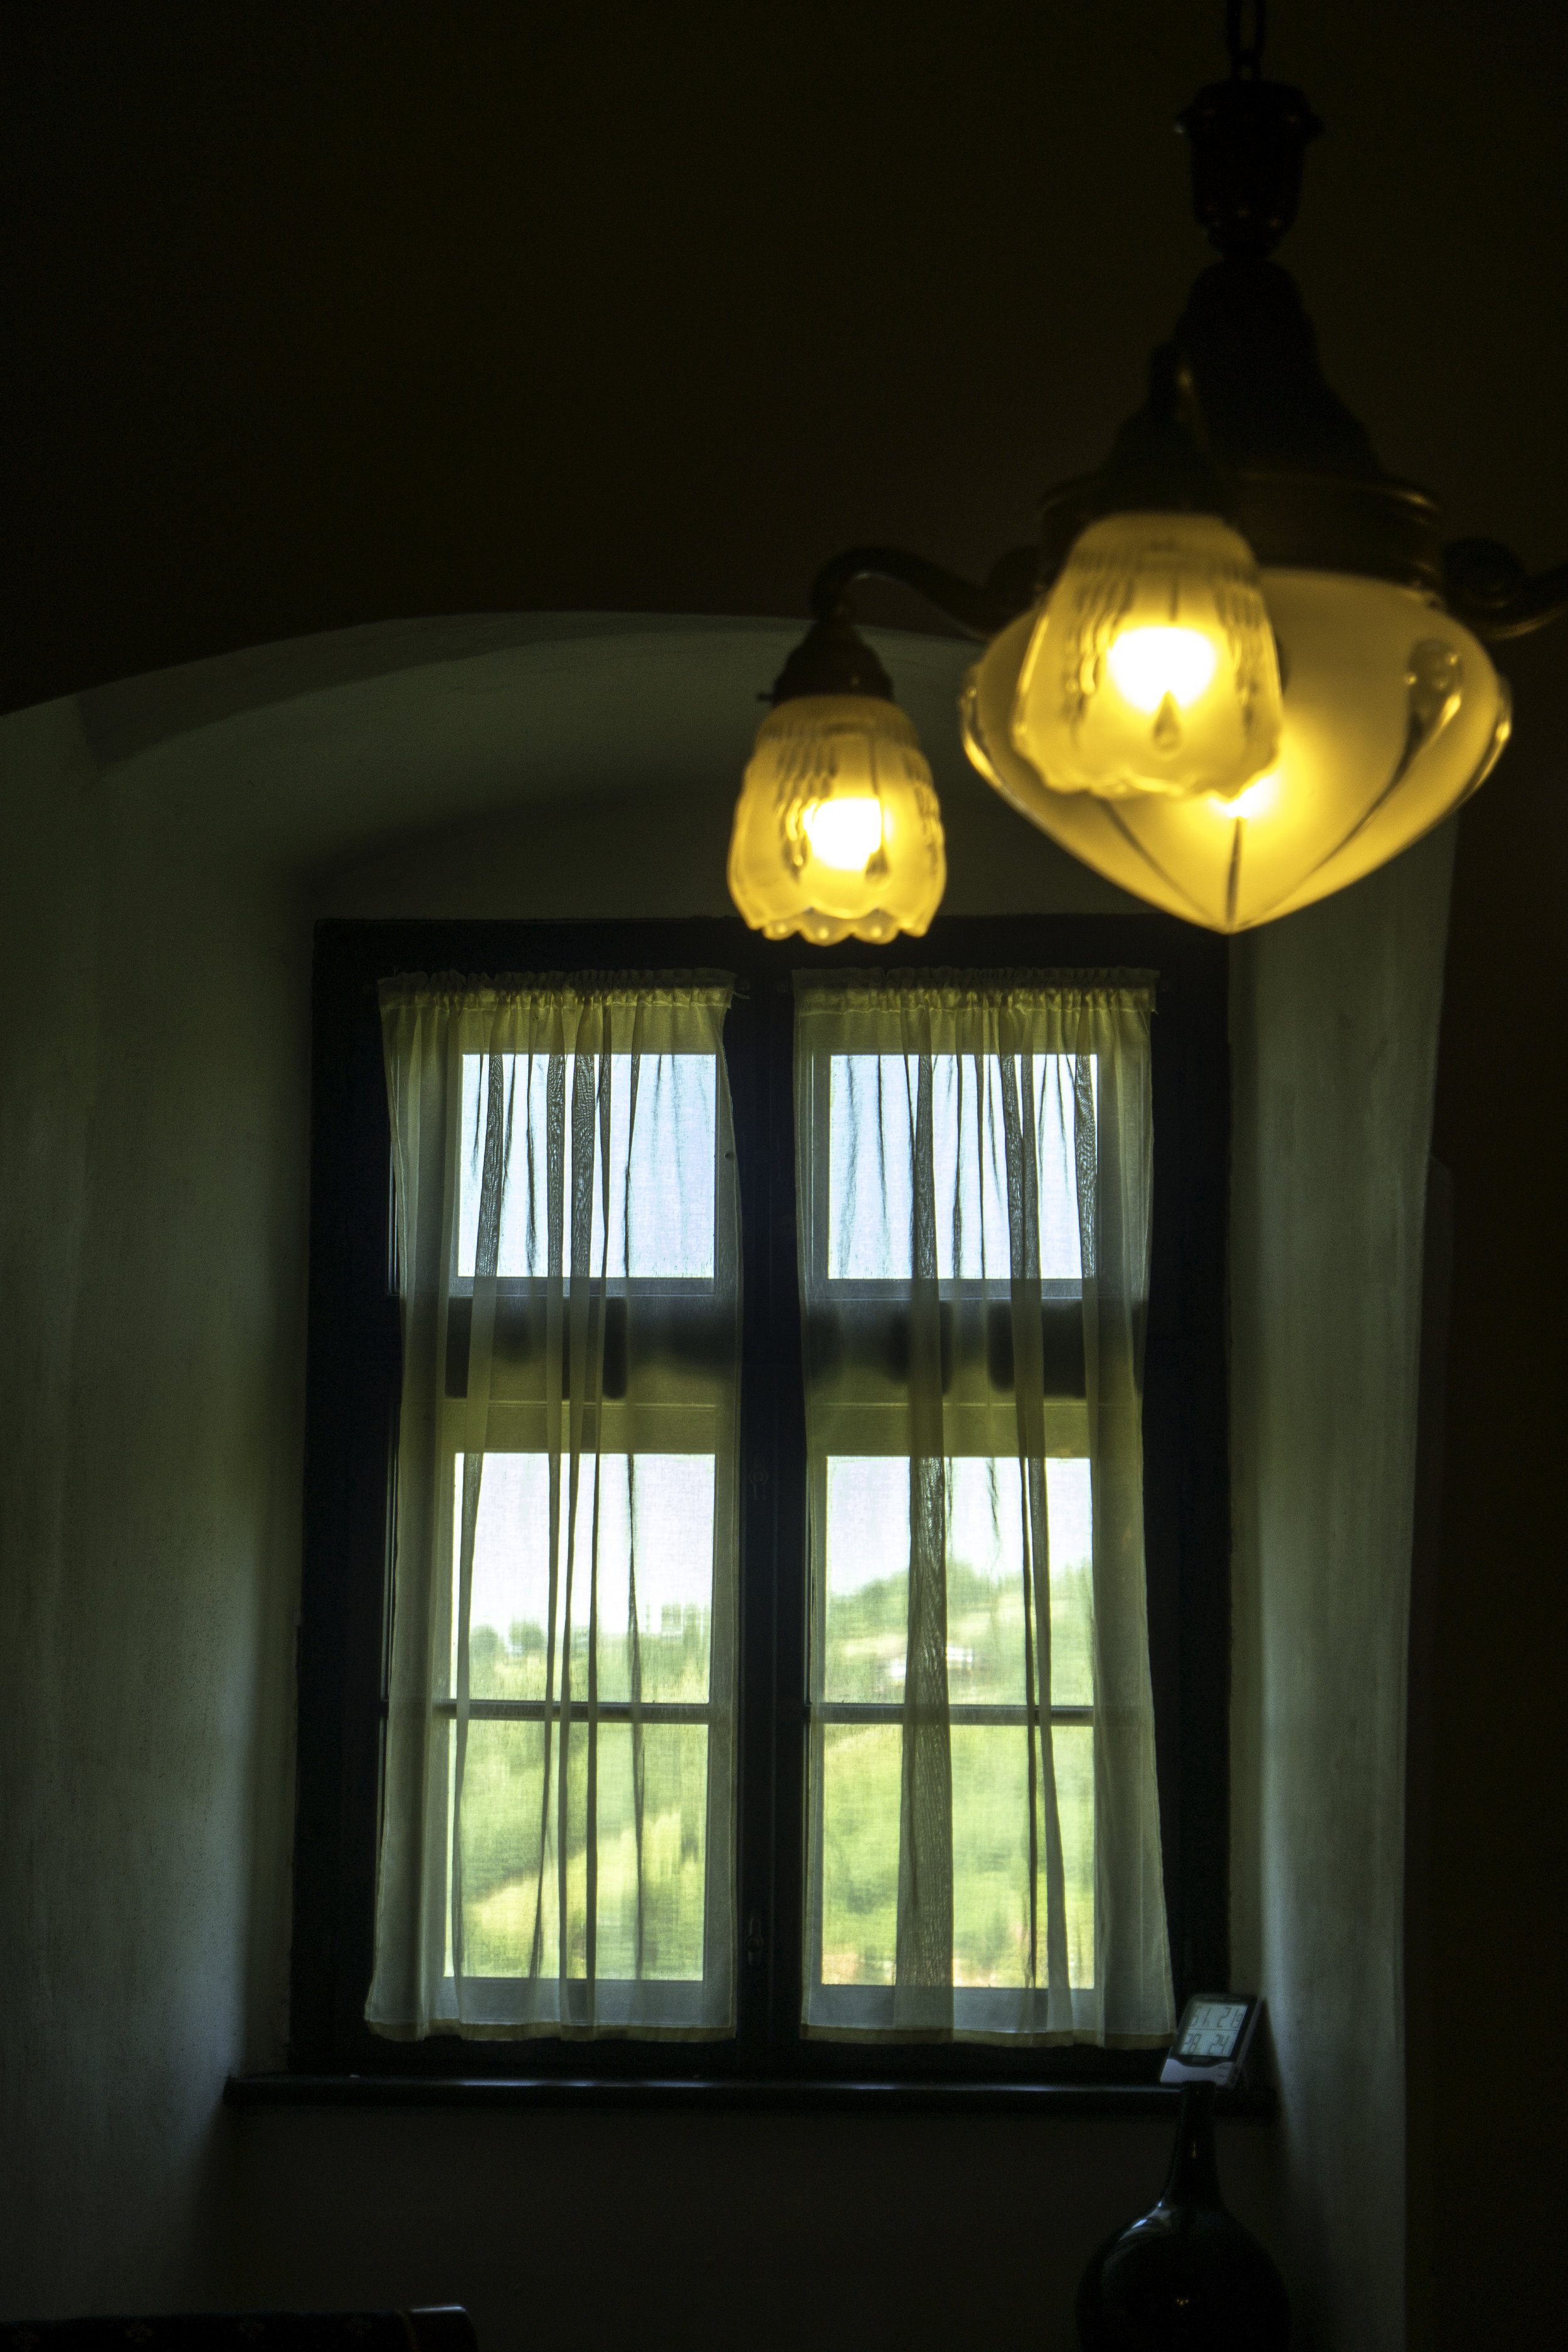 Bran-Castle-Romania-lights-window.jpg